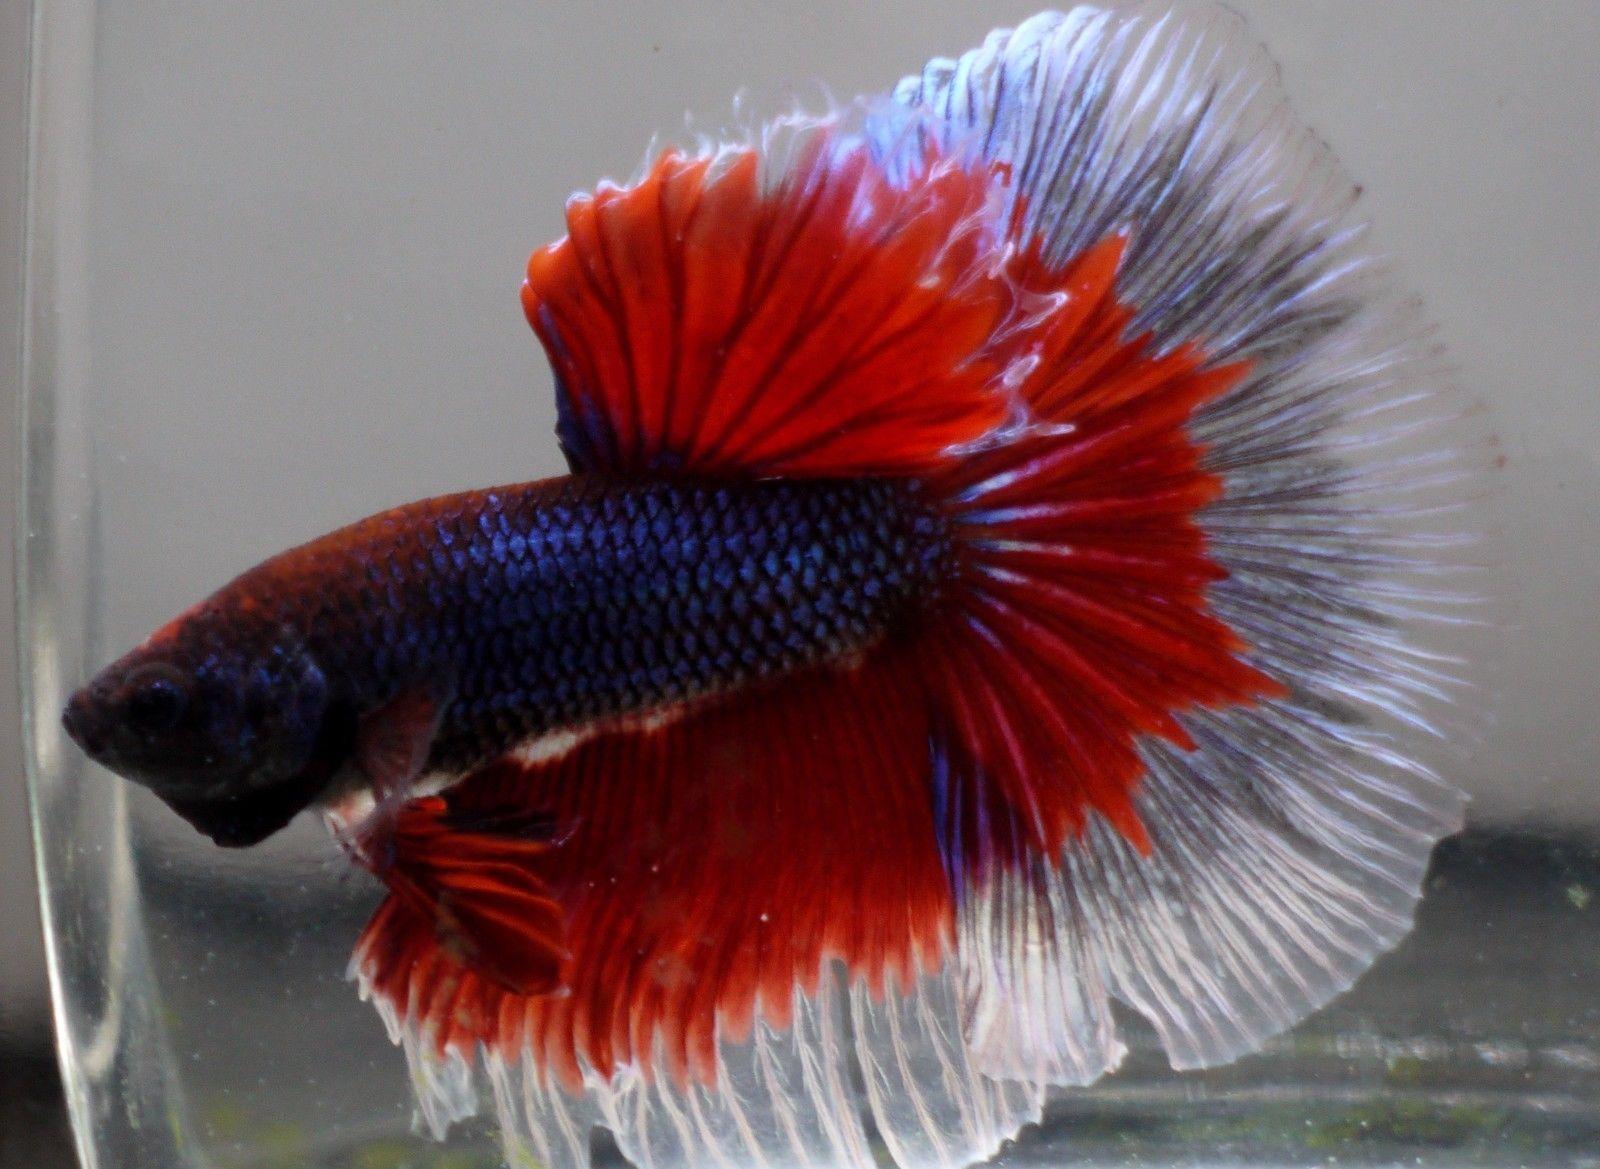 Betta Fish Colors | Aquarium | Pinterest | Betta fish, Colors and Betta